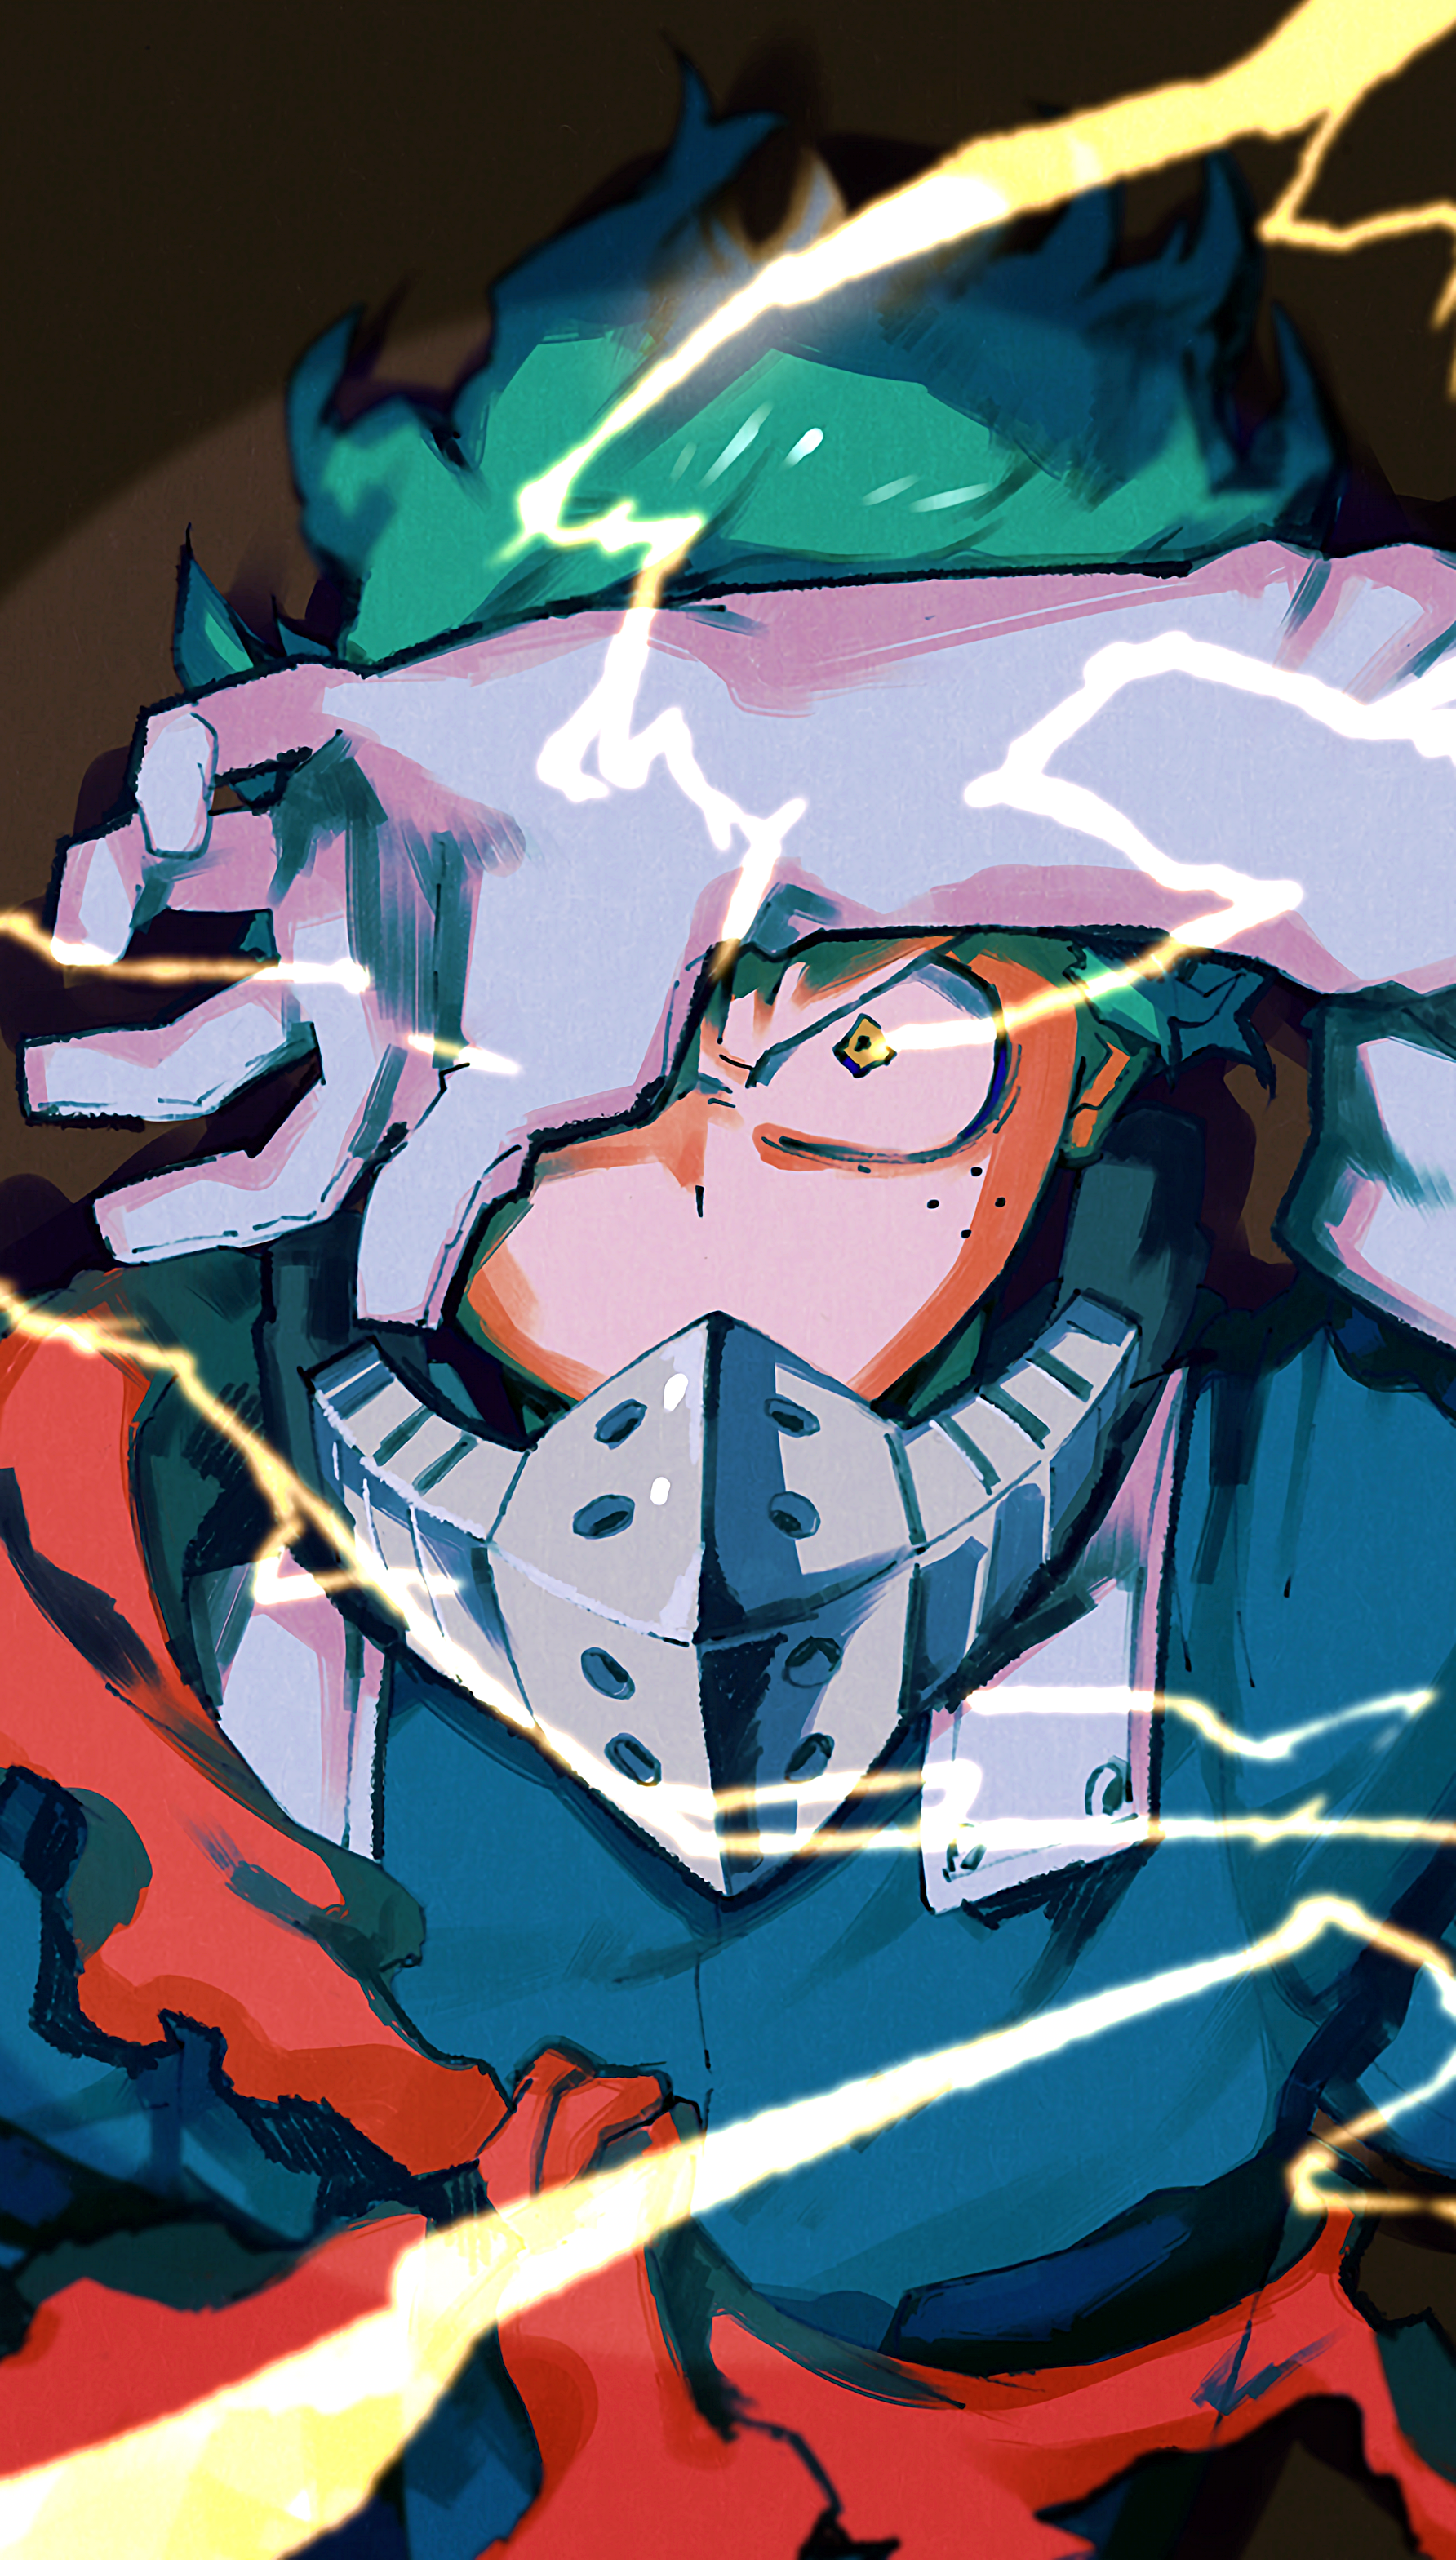 Pin By Warren Lee On Aniiiiiimmmmmmeee Manga Madness In 2020 With Images Deku Boku No Hero My Hero Hero Wallpaper My Hero Hero Wallpaper Hero